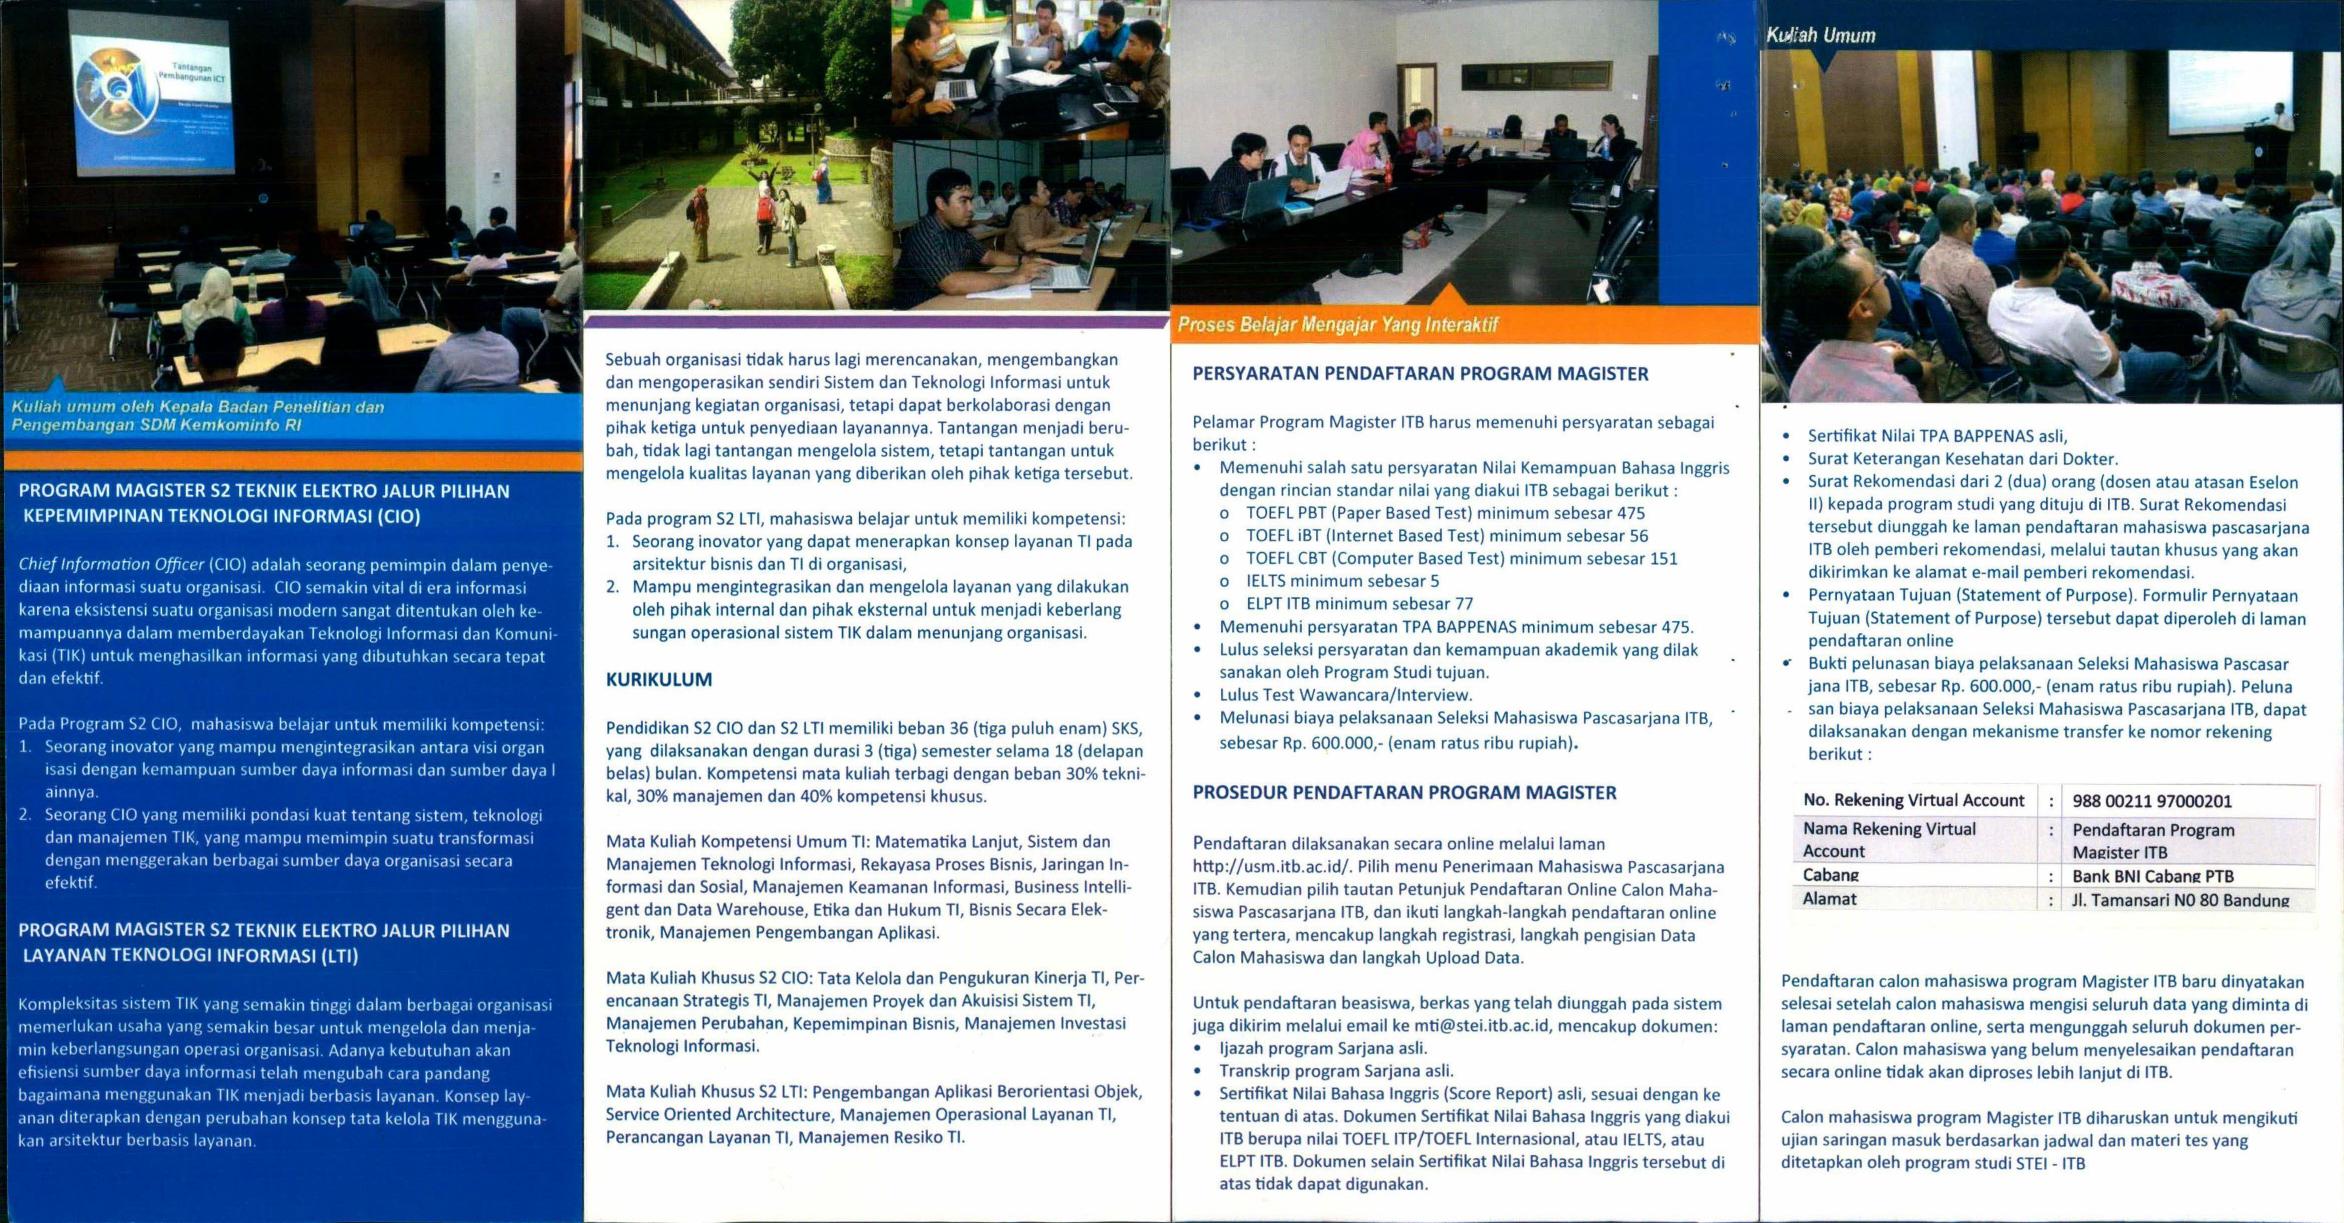 Persyaratan Pendaftaran Program Magister Prosedur